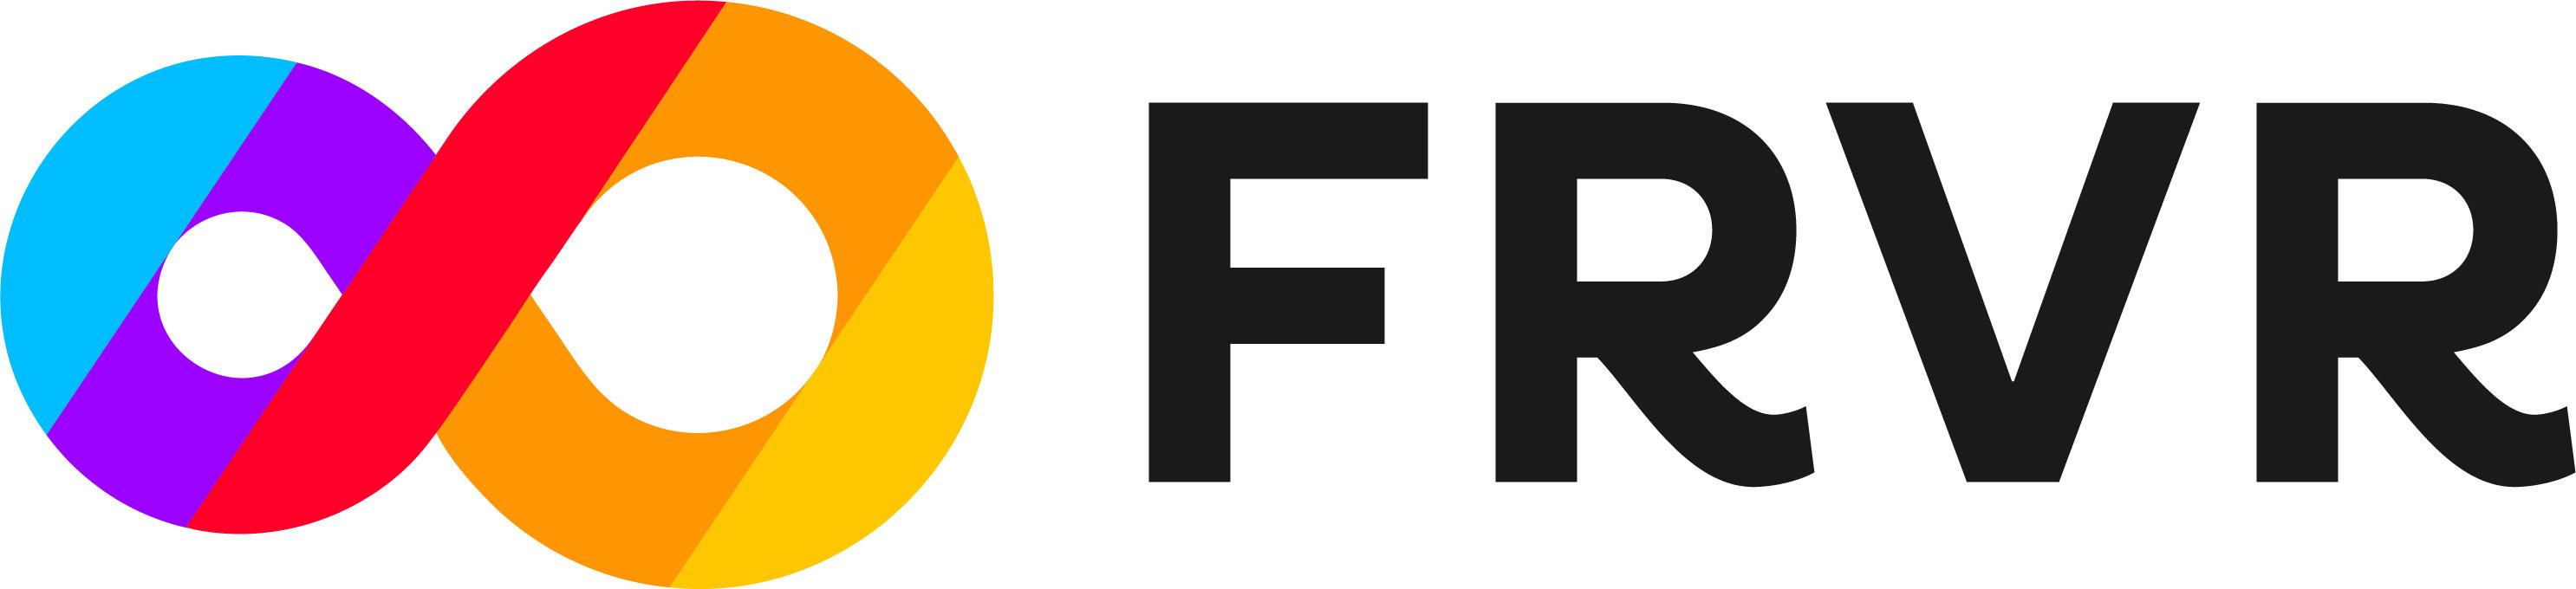 Frvr logo rgb